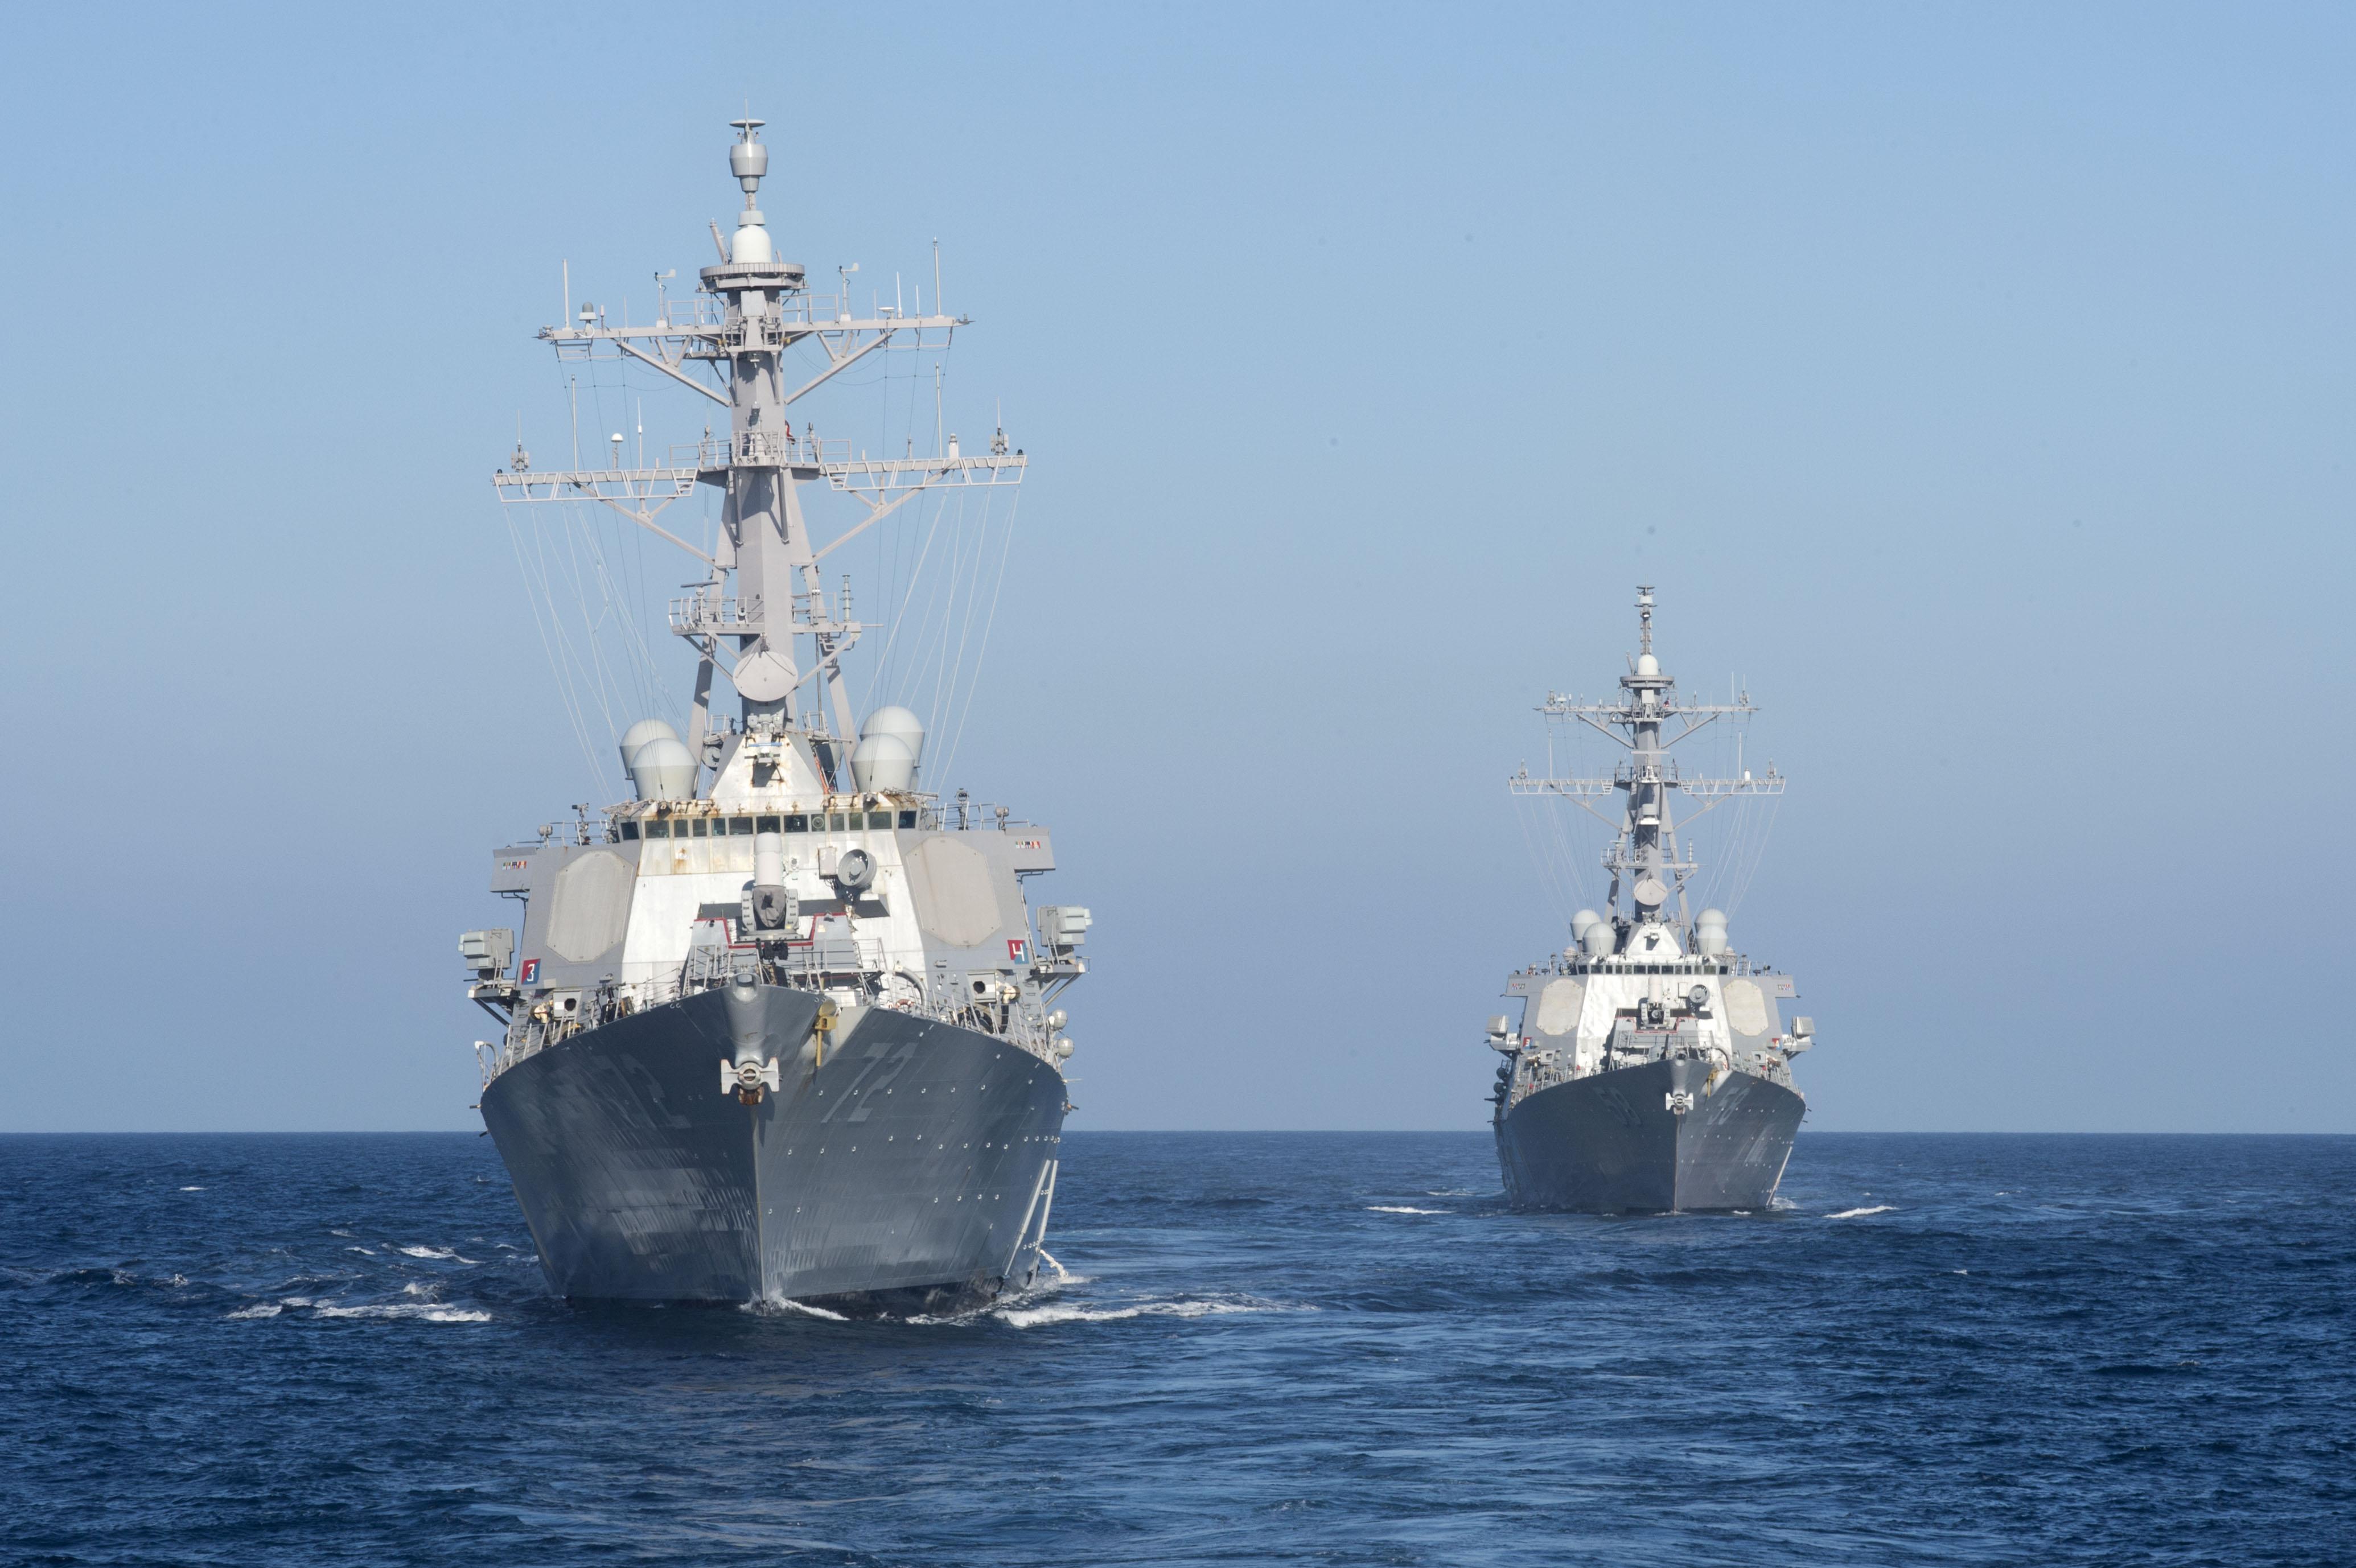 Photo credit: MC2 Jonathan Trejo/U.S. Navy